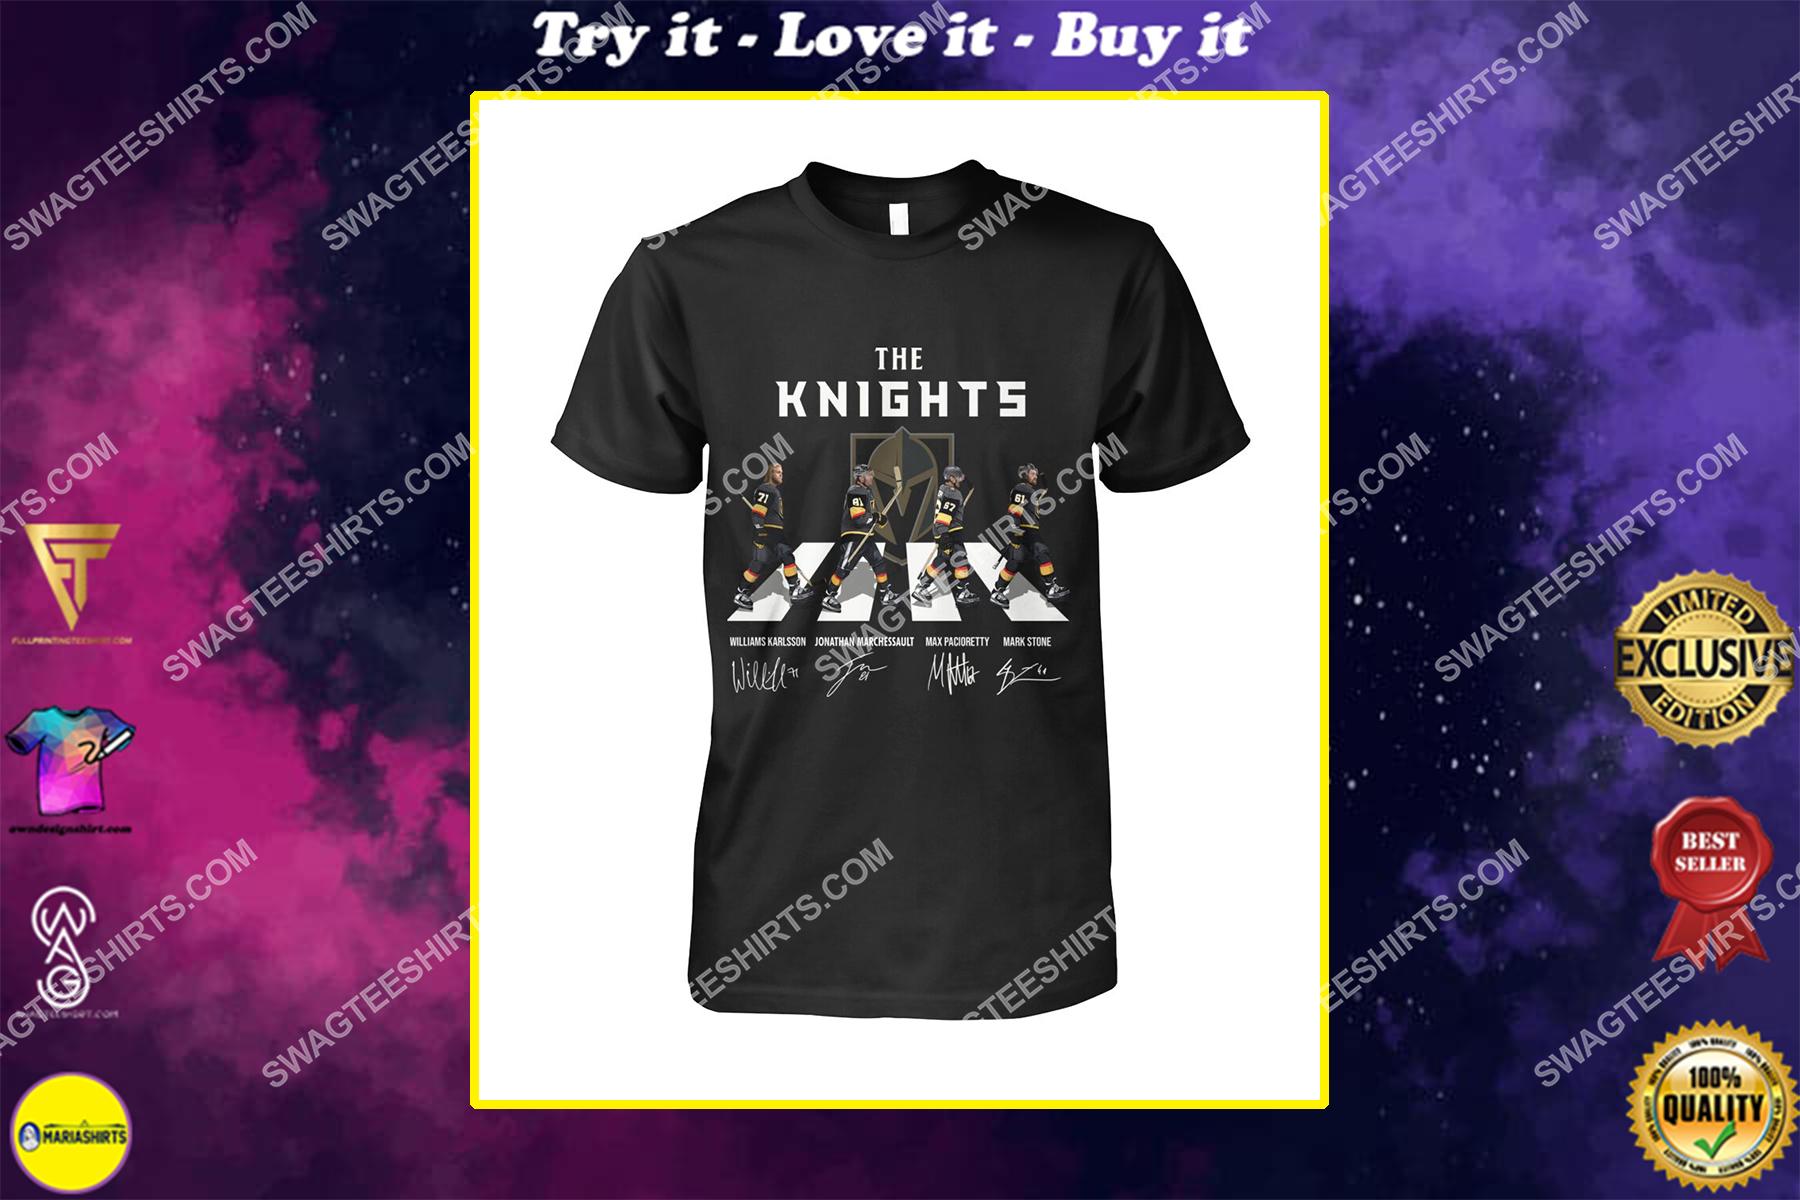 the vegas golden knights walking abbey road shirt